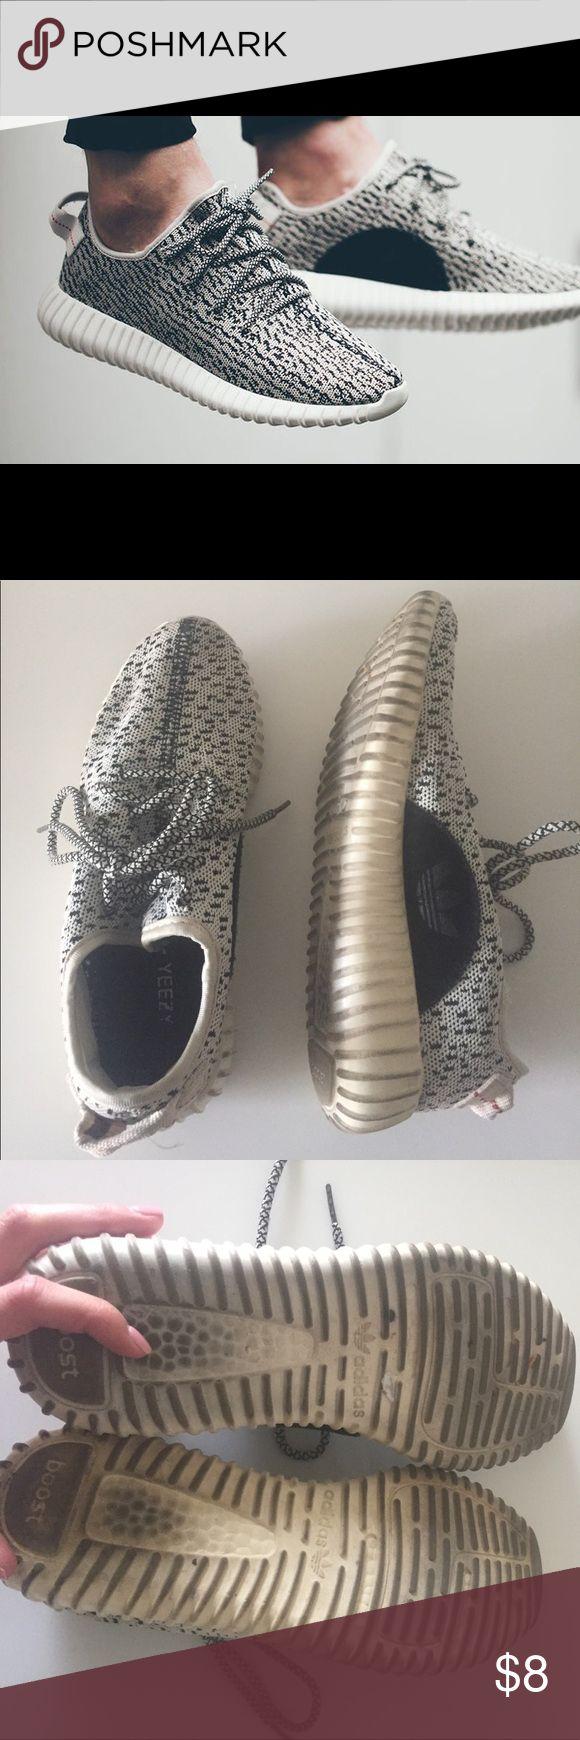 Yeezy Boost Black White sneakers Black white Yeezy Boost replica shoes. FAKE YEEZYS. Yeezy Shoes Sneakers